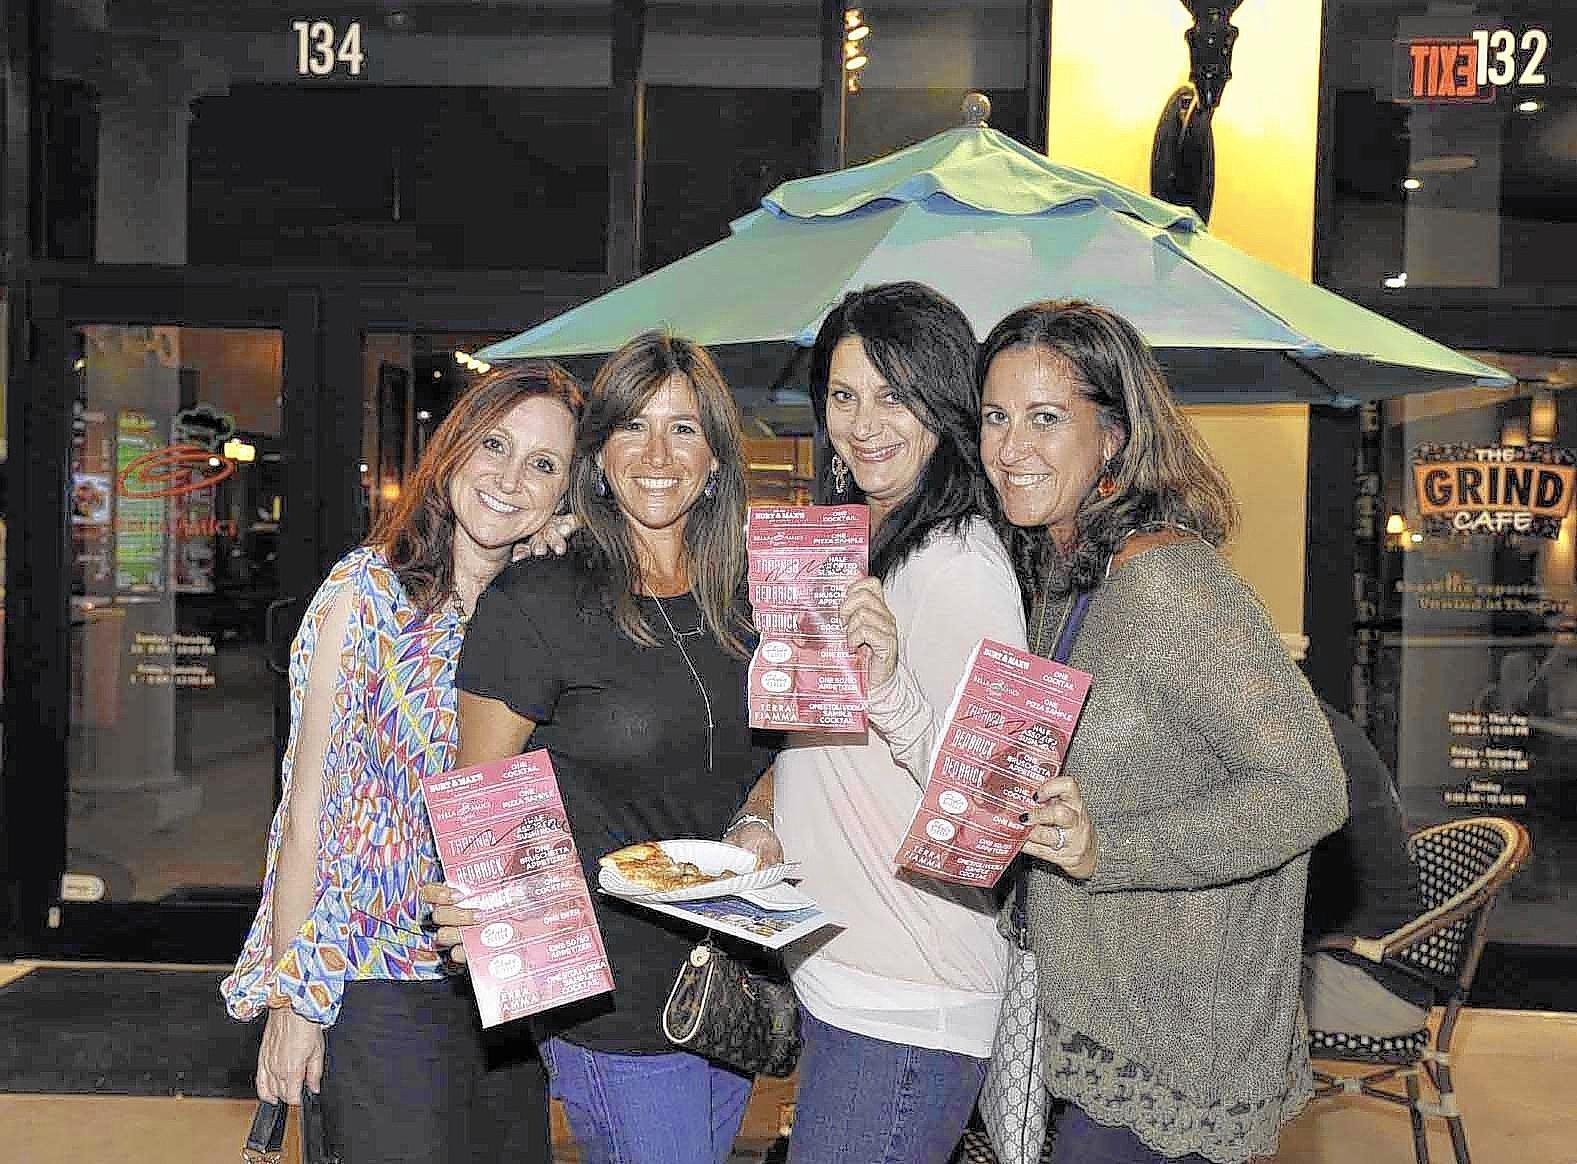 From left, Wendi Lipsich, Tara Gray, Trisha Shepard and Susan Petosa at Taste of Delray Marketplace last year.